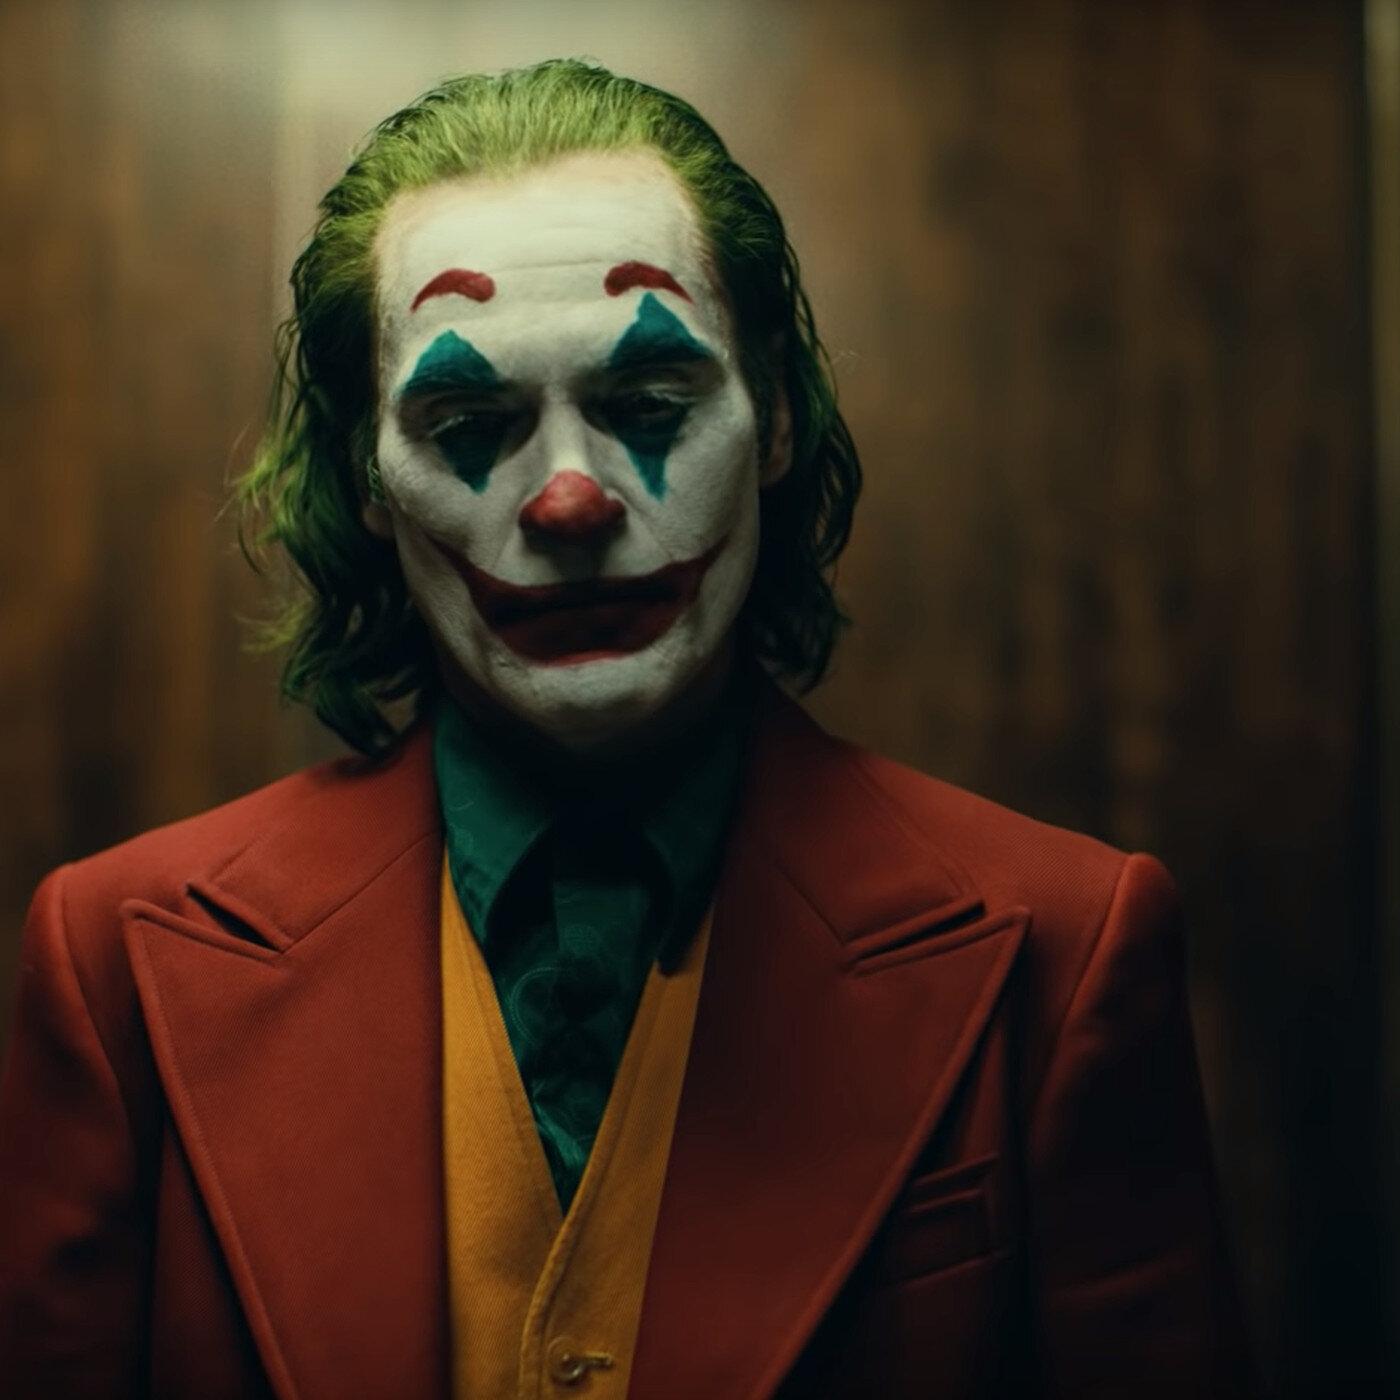 Joker - Dir. Todd Phillips, Oct. 2019